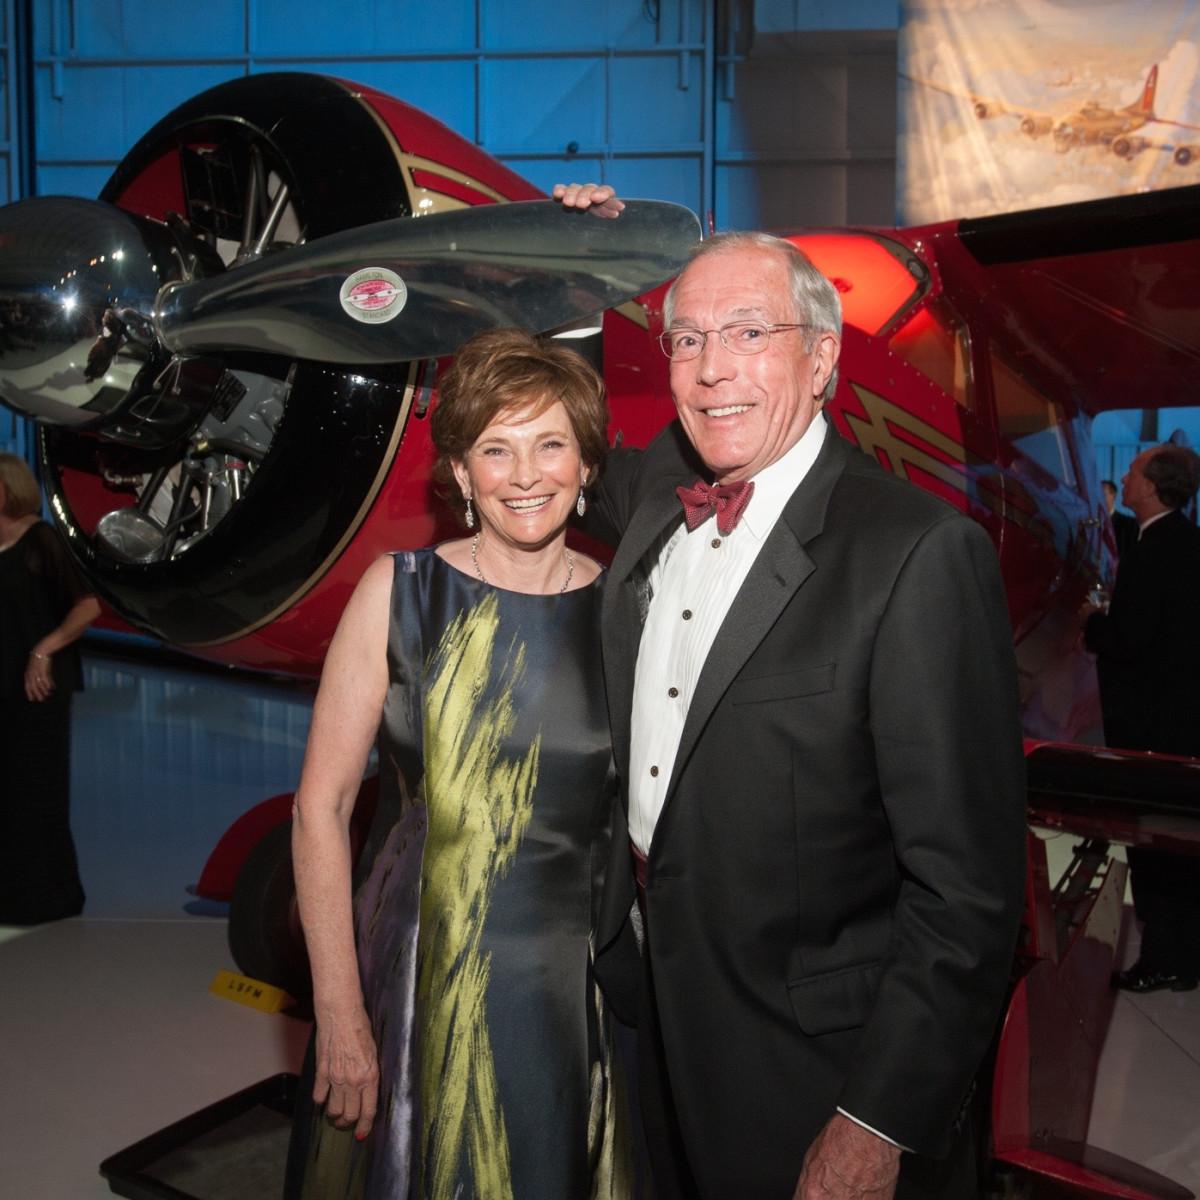 Lone Star Flight Museum gala 5/16 Bobbie Nau, John Nau